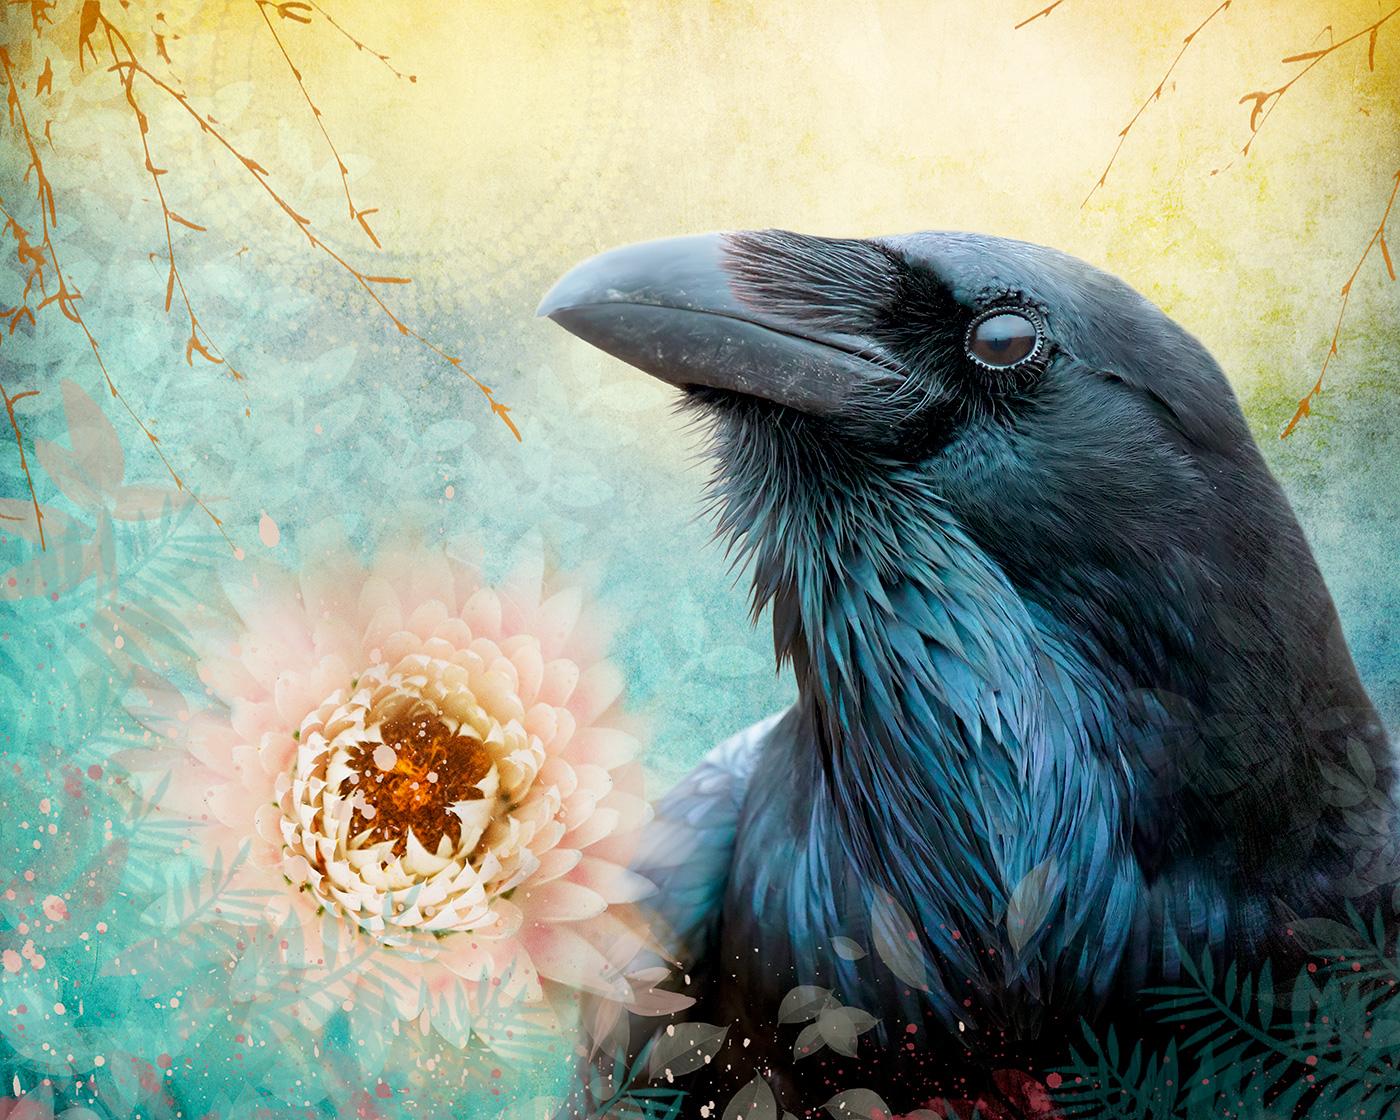 My Raven Companions